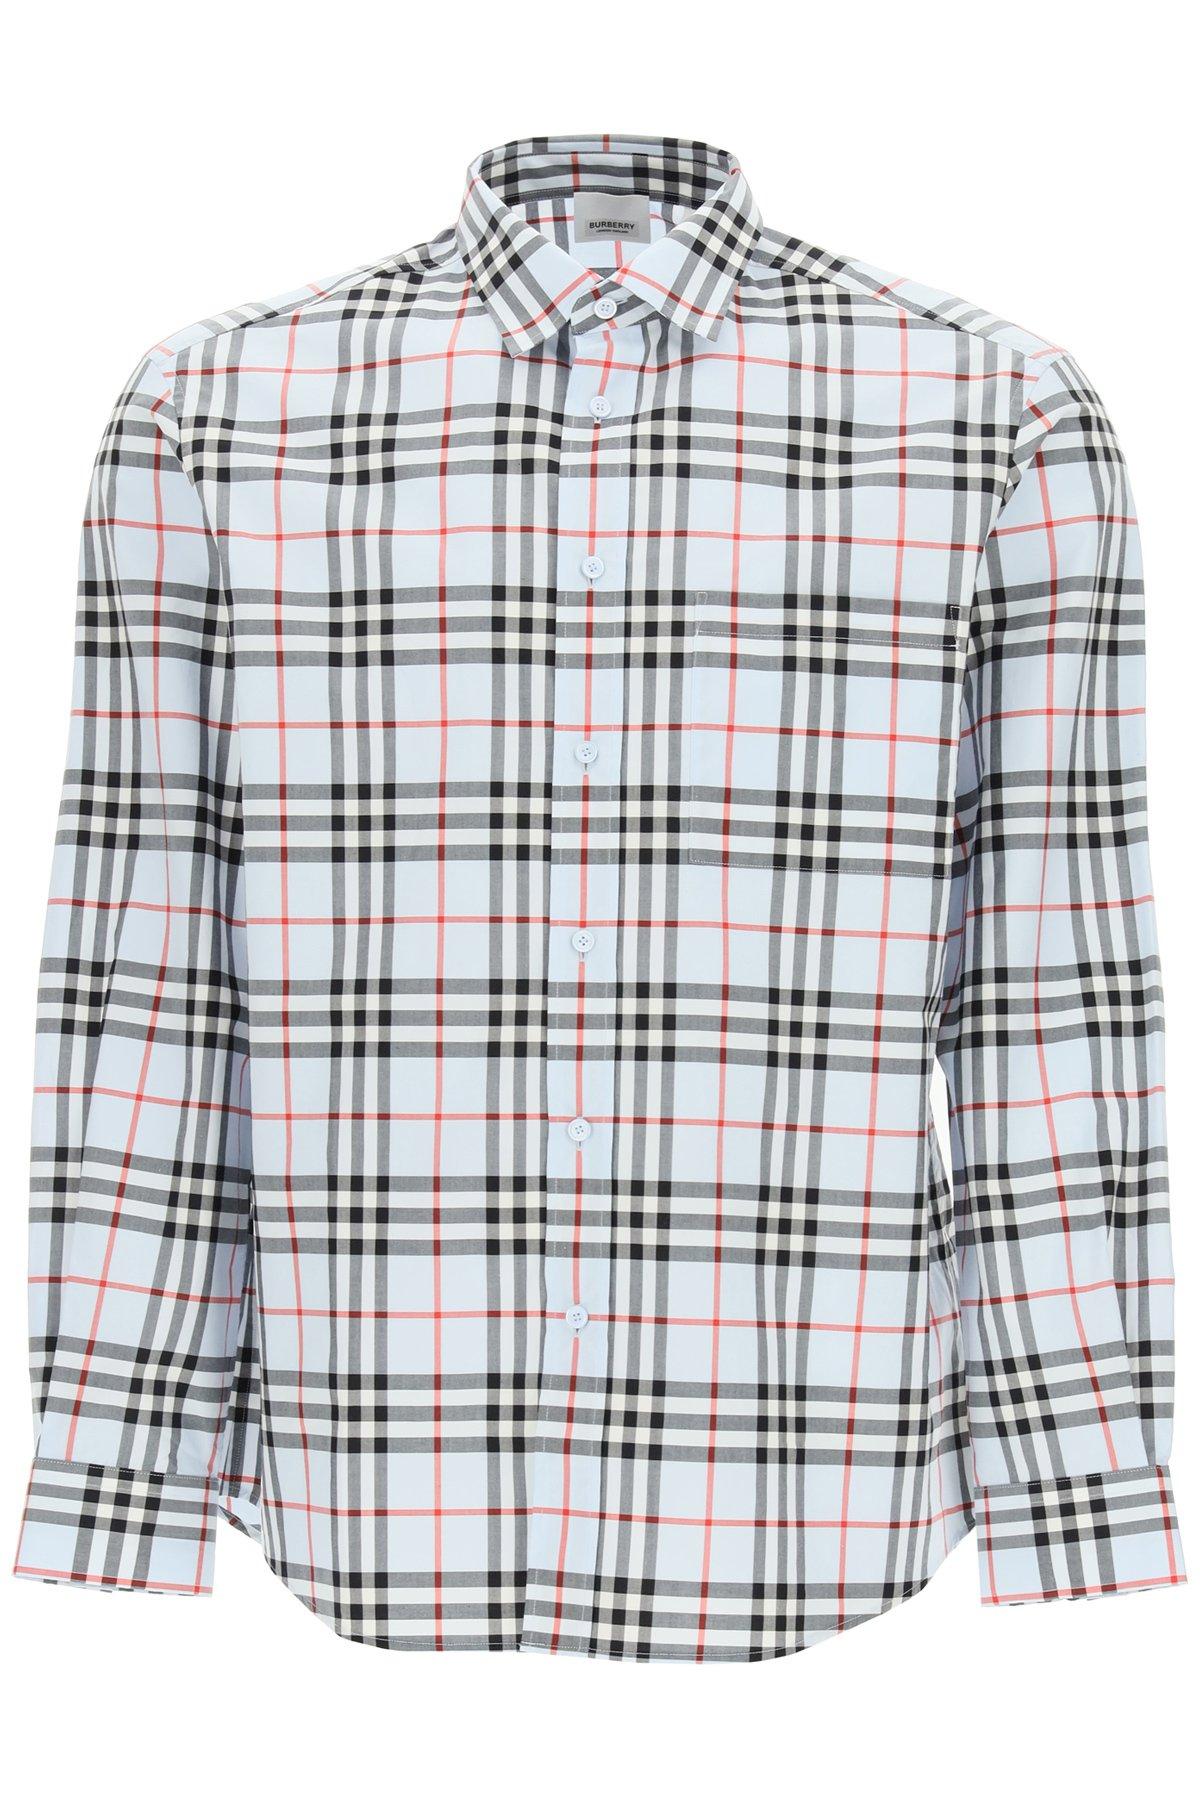 Burberry camicia chalcroft vintage check 116592